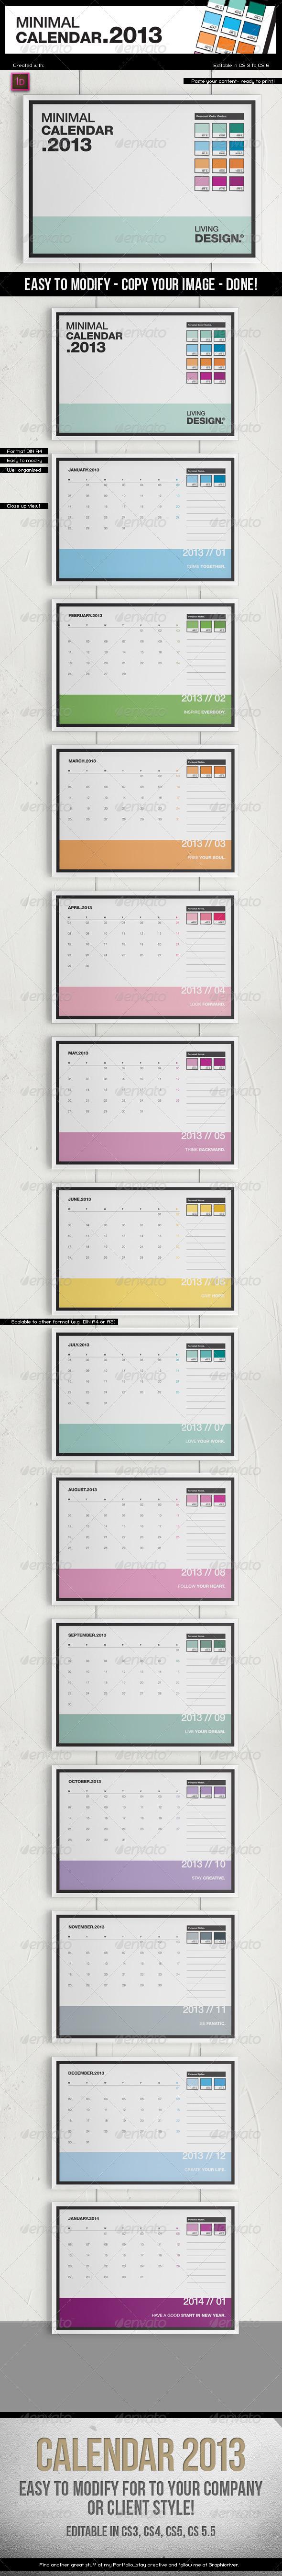 Calendar 2013 A4 Template Pantone Style